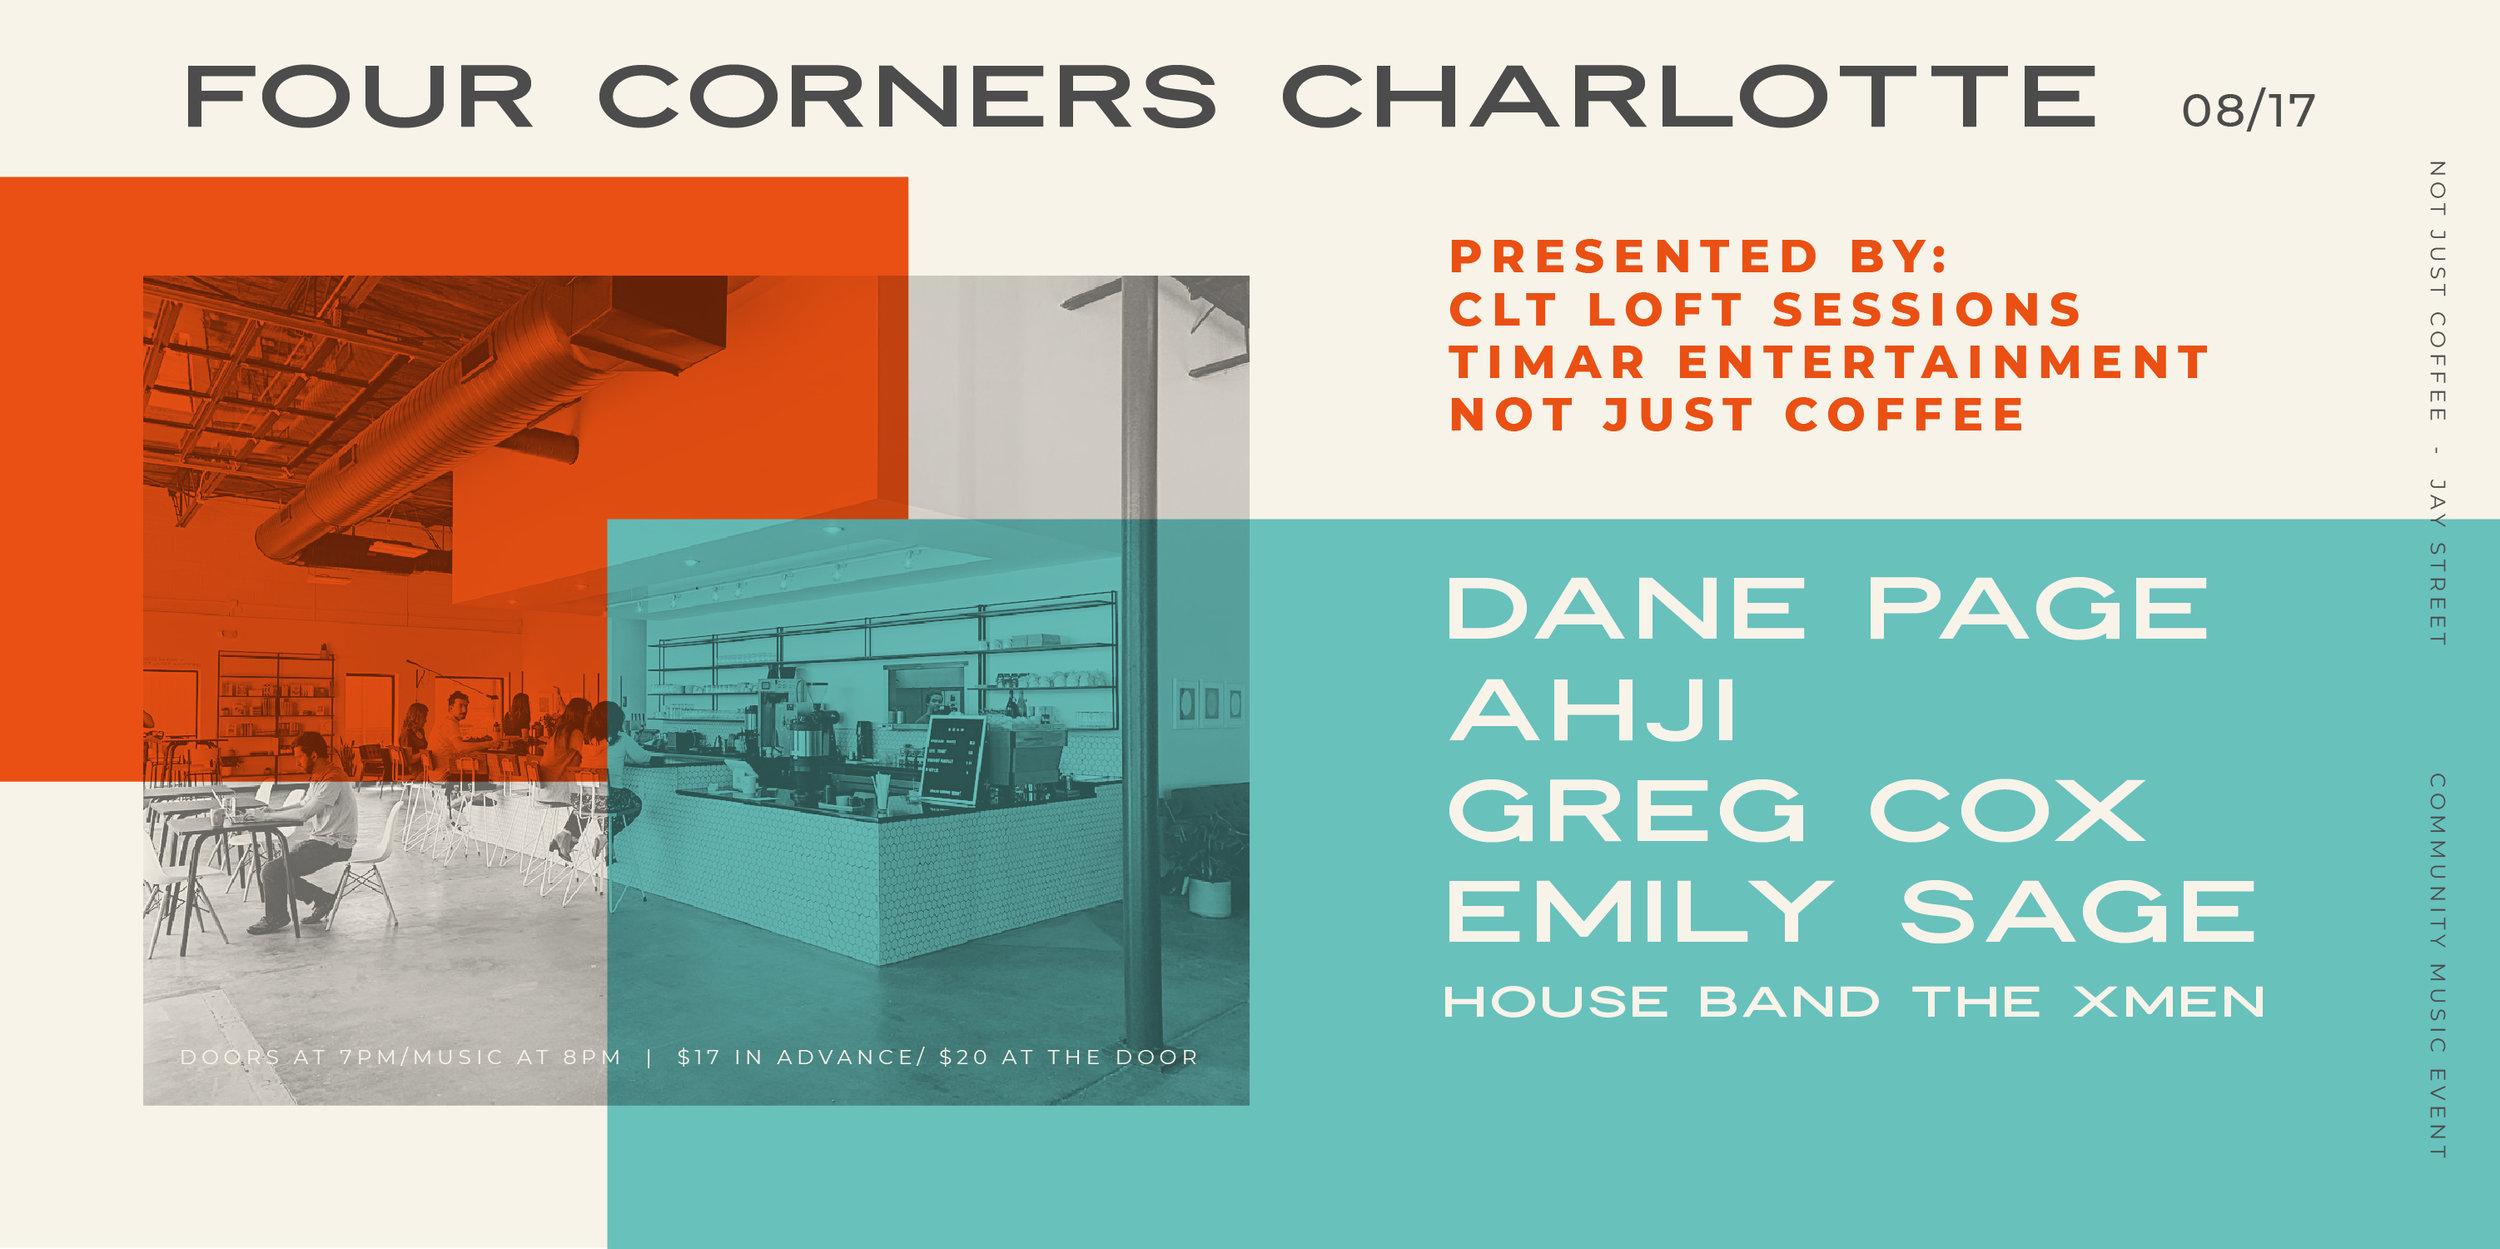 Four Corners Poster Art 2.1 ratio-05.jpg